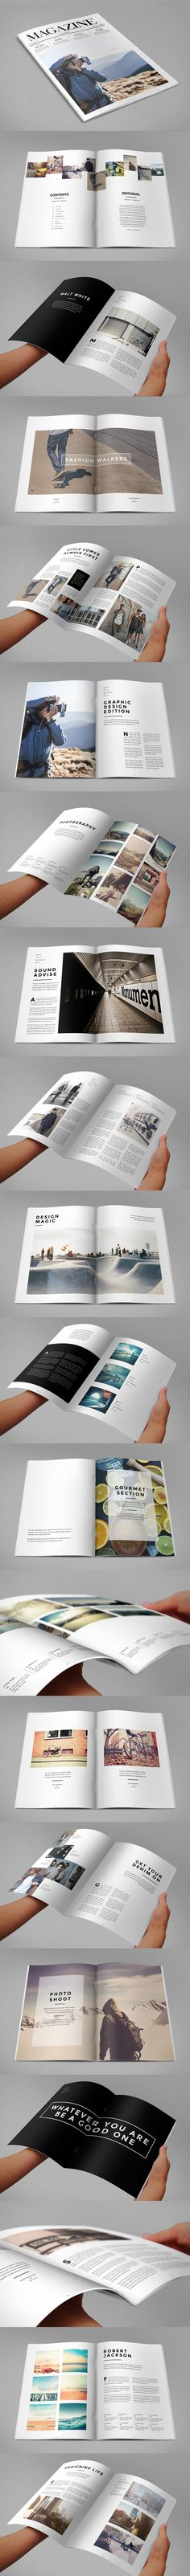 https://www.behance.net/gallery/19894717/Minimal-Style-Magazine